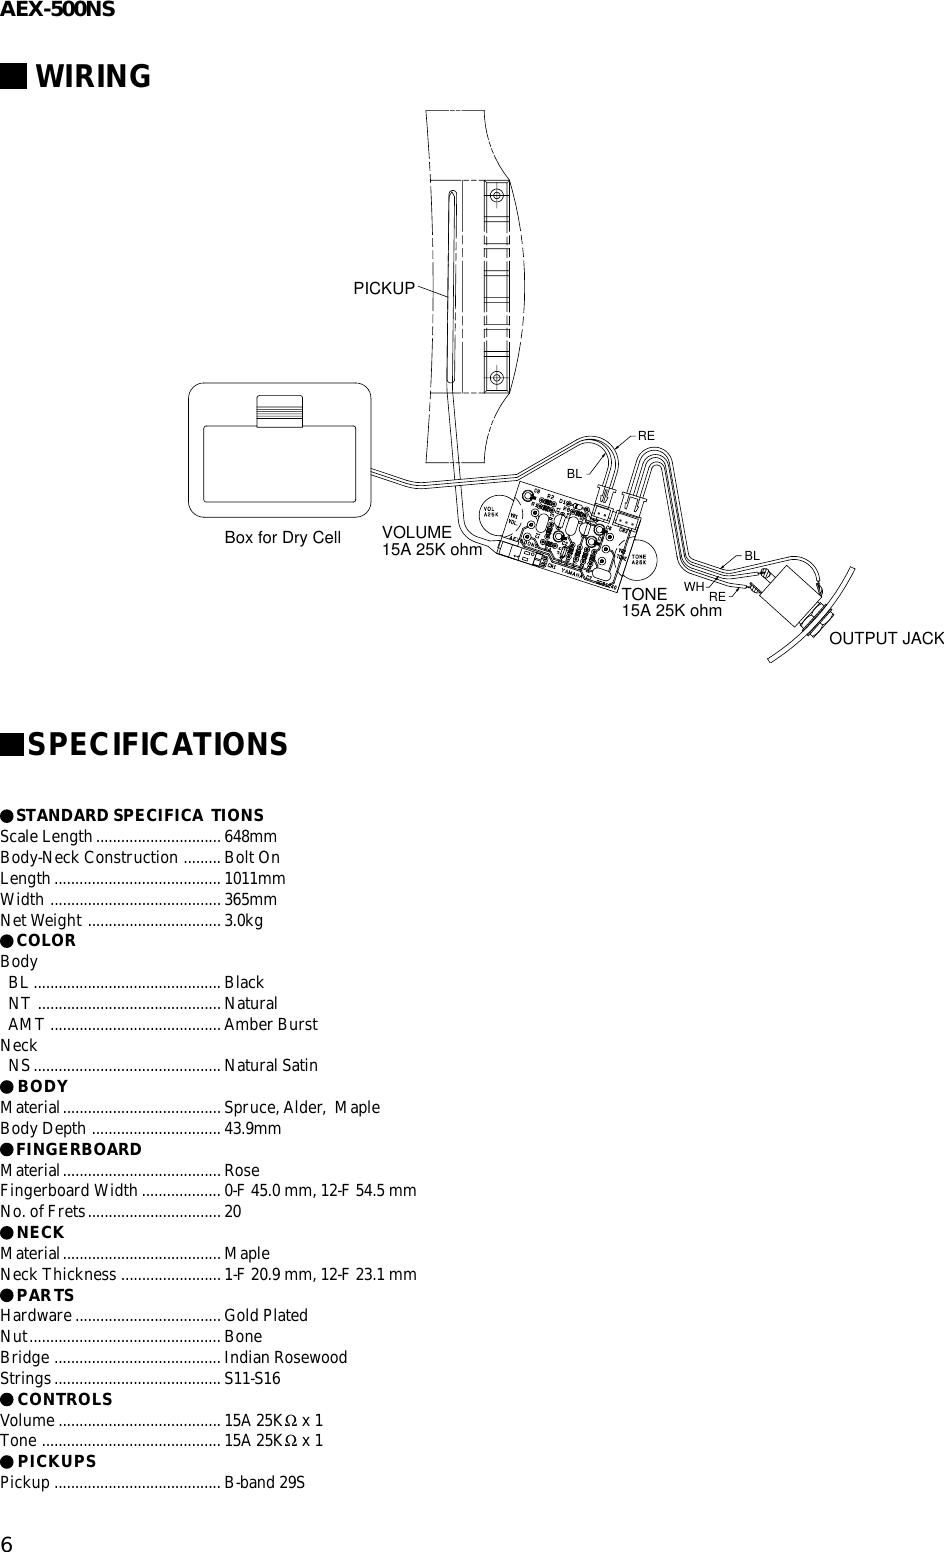 Yamaha Guitar Aex 500ns Users Manual Electric Humbucker Pickup Wiring Page 6 Of